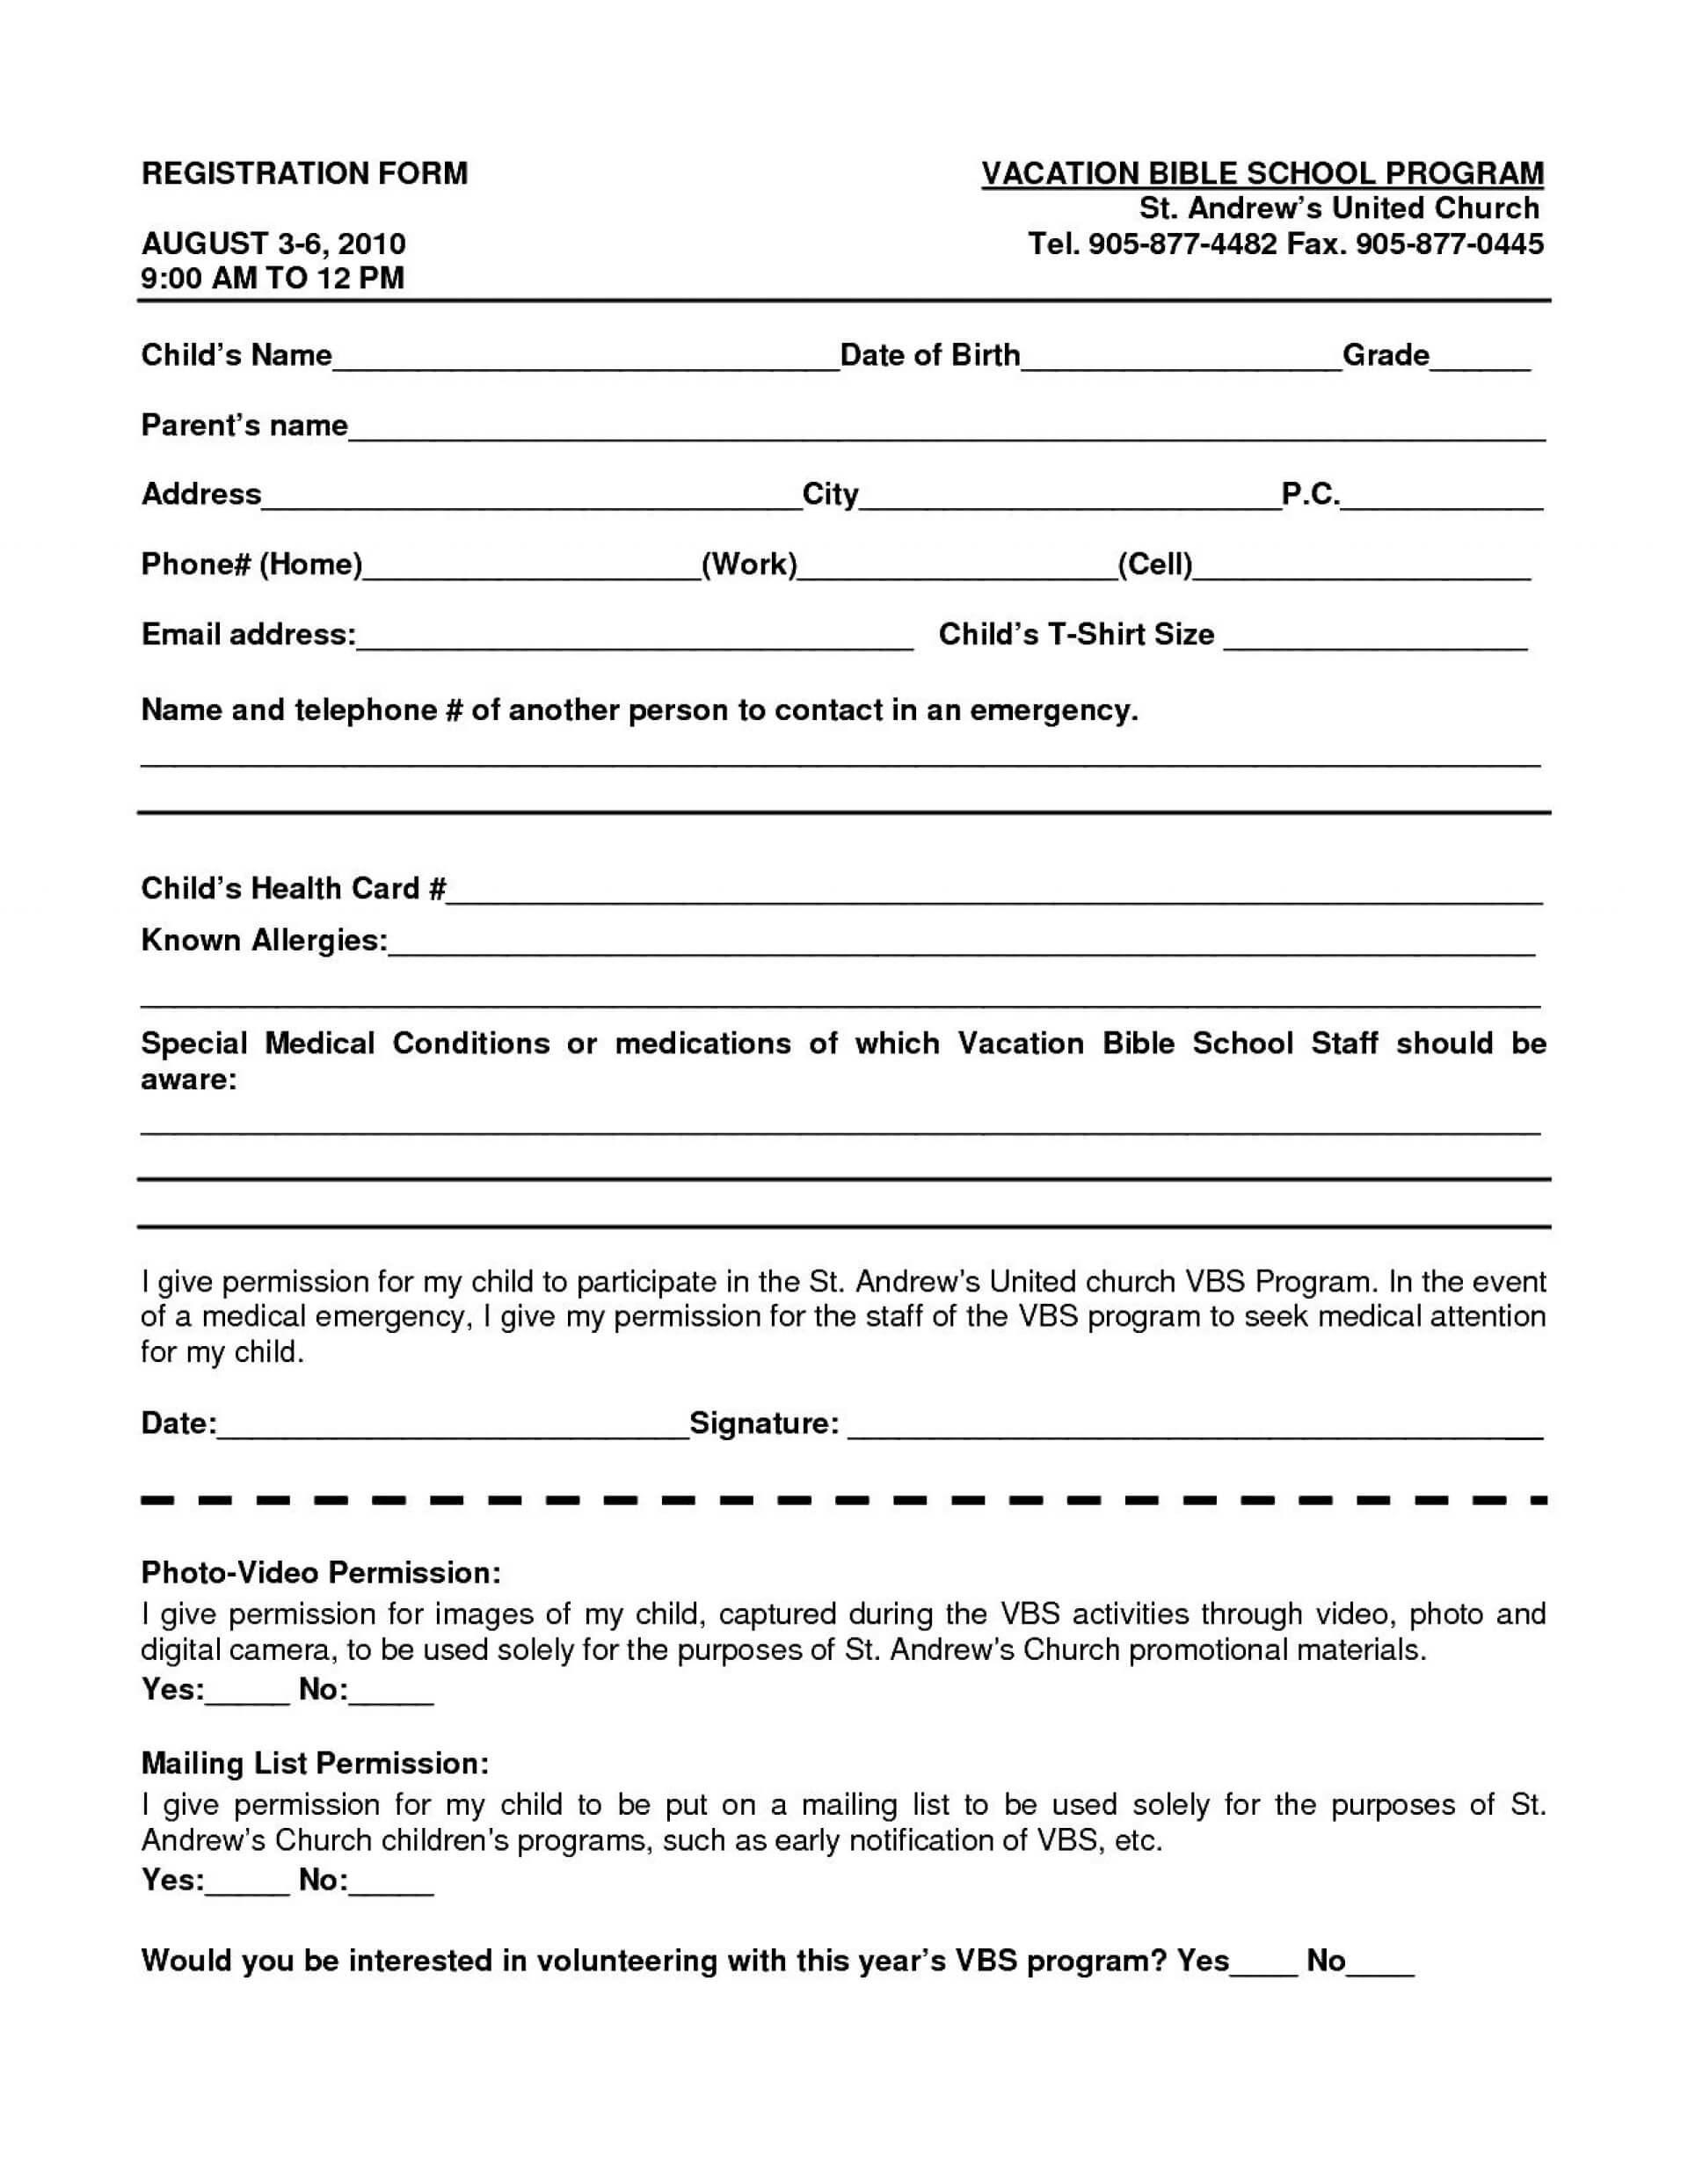 016 School Registration Form Template Word Ideas Free In Within School Registration Form Template Word